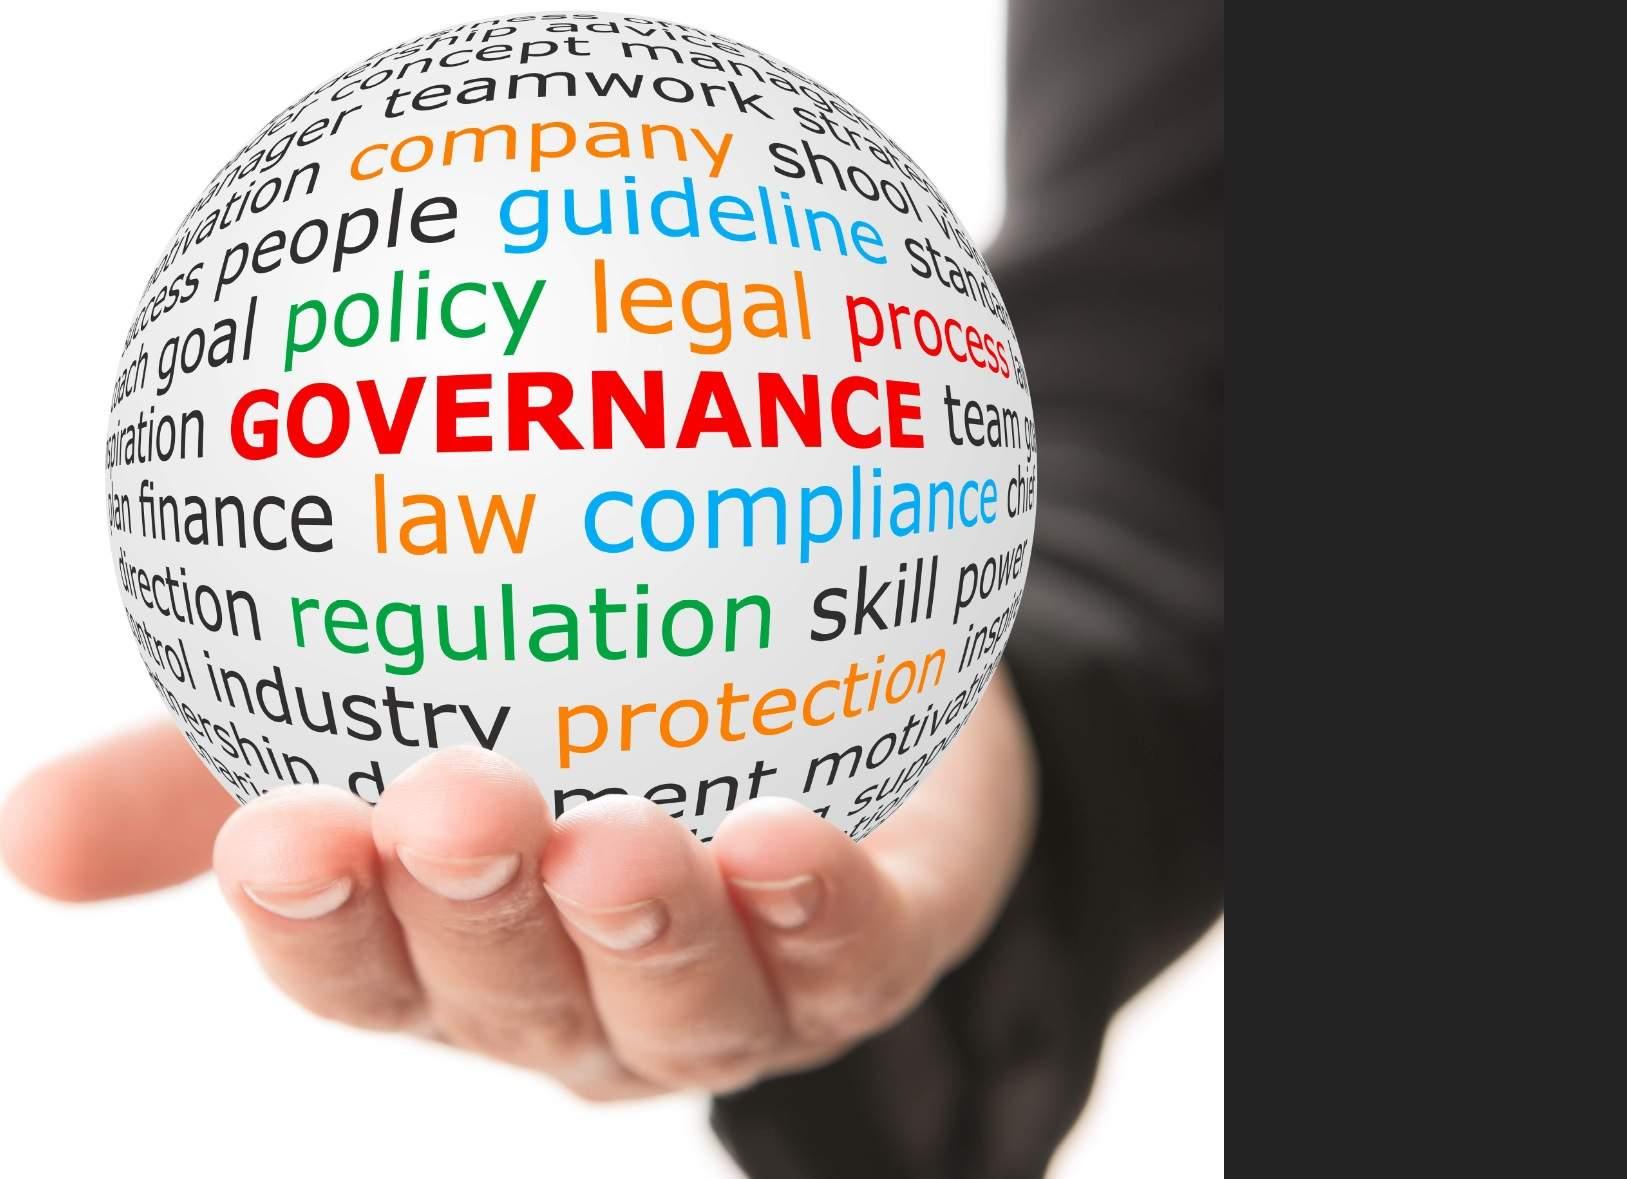 Postgraduate Certificate in Corporate Governance